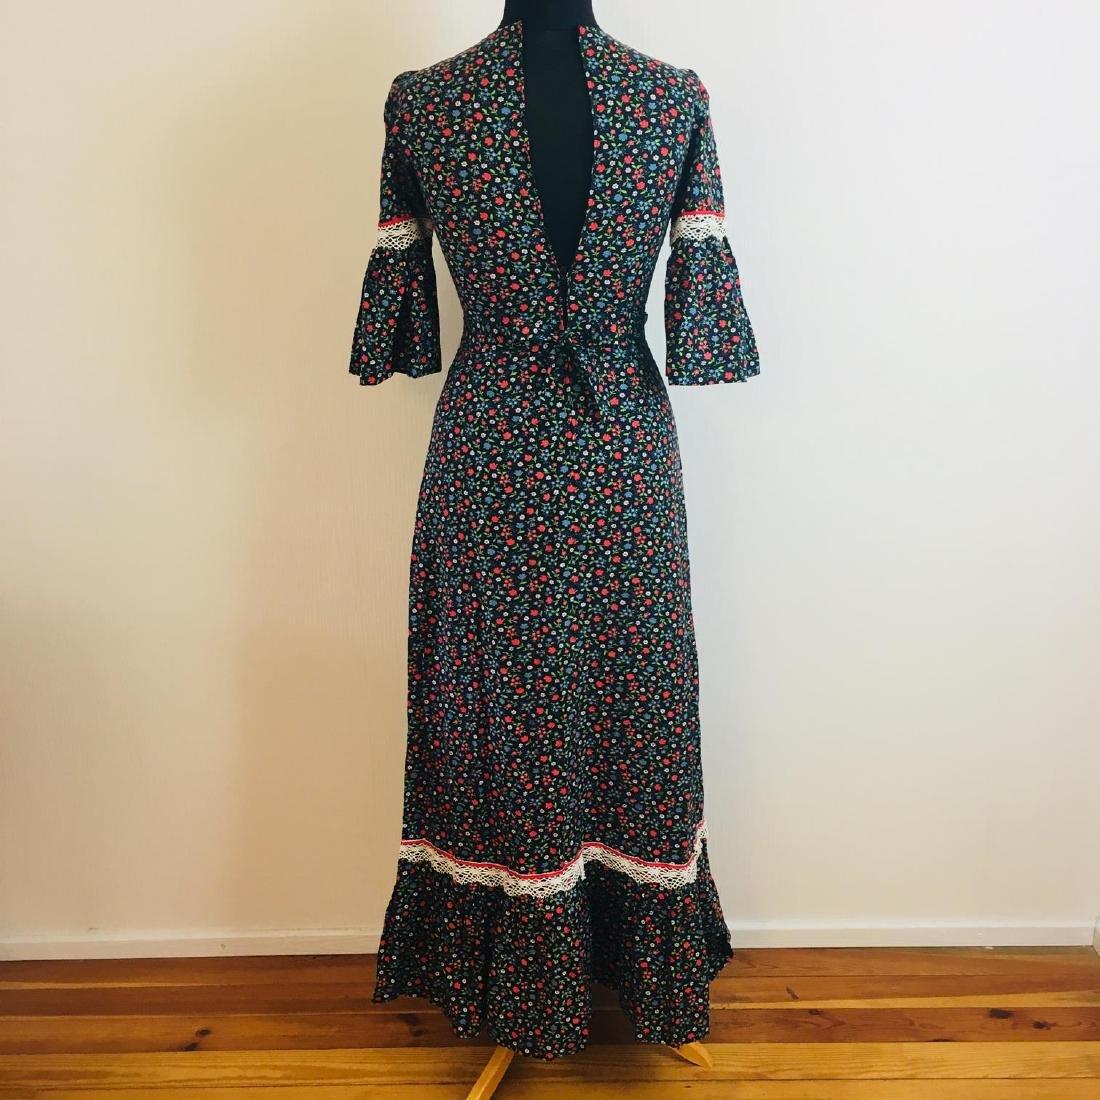 Vintage Women's Tyrolean Style Dress Size EUR 36 US 6 - 5